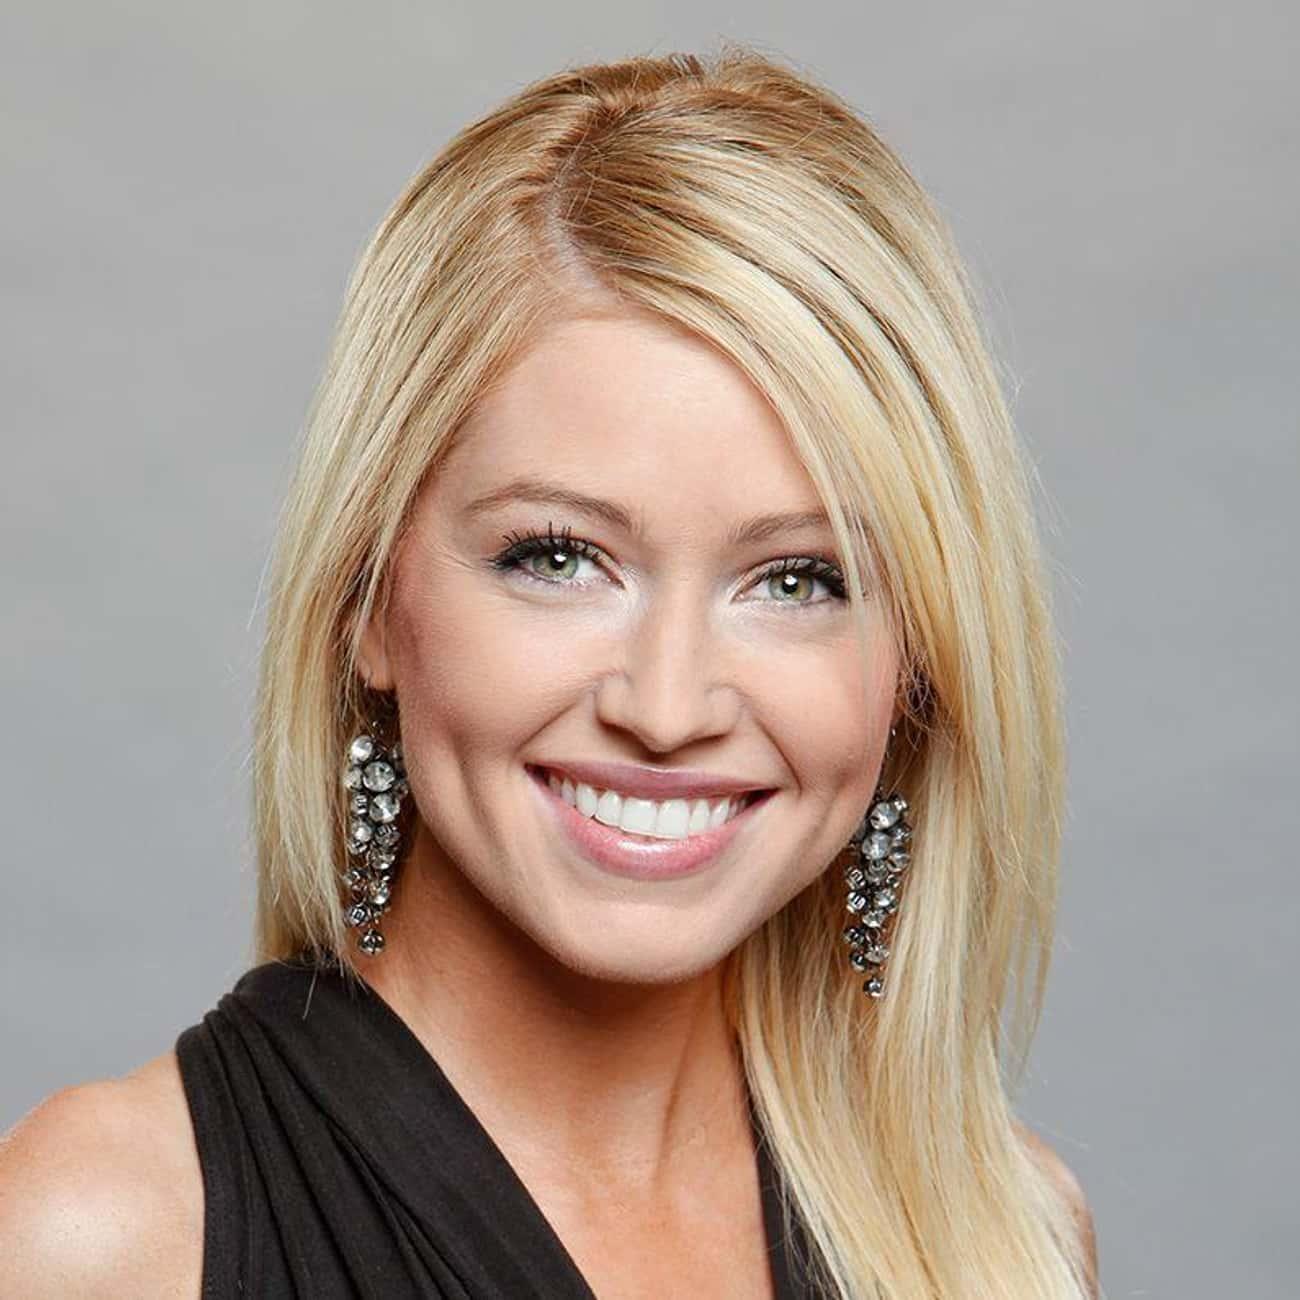 Britney Haynes is listed (or ranked) 1 on the list The Ladies of Big Brother America Seasons 11-20 Ranked